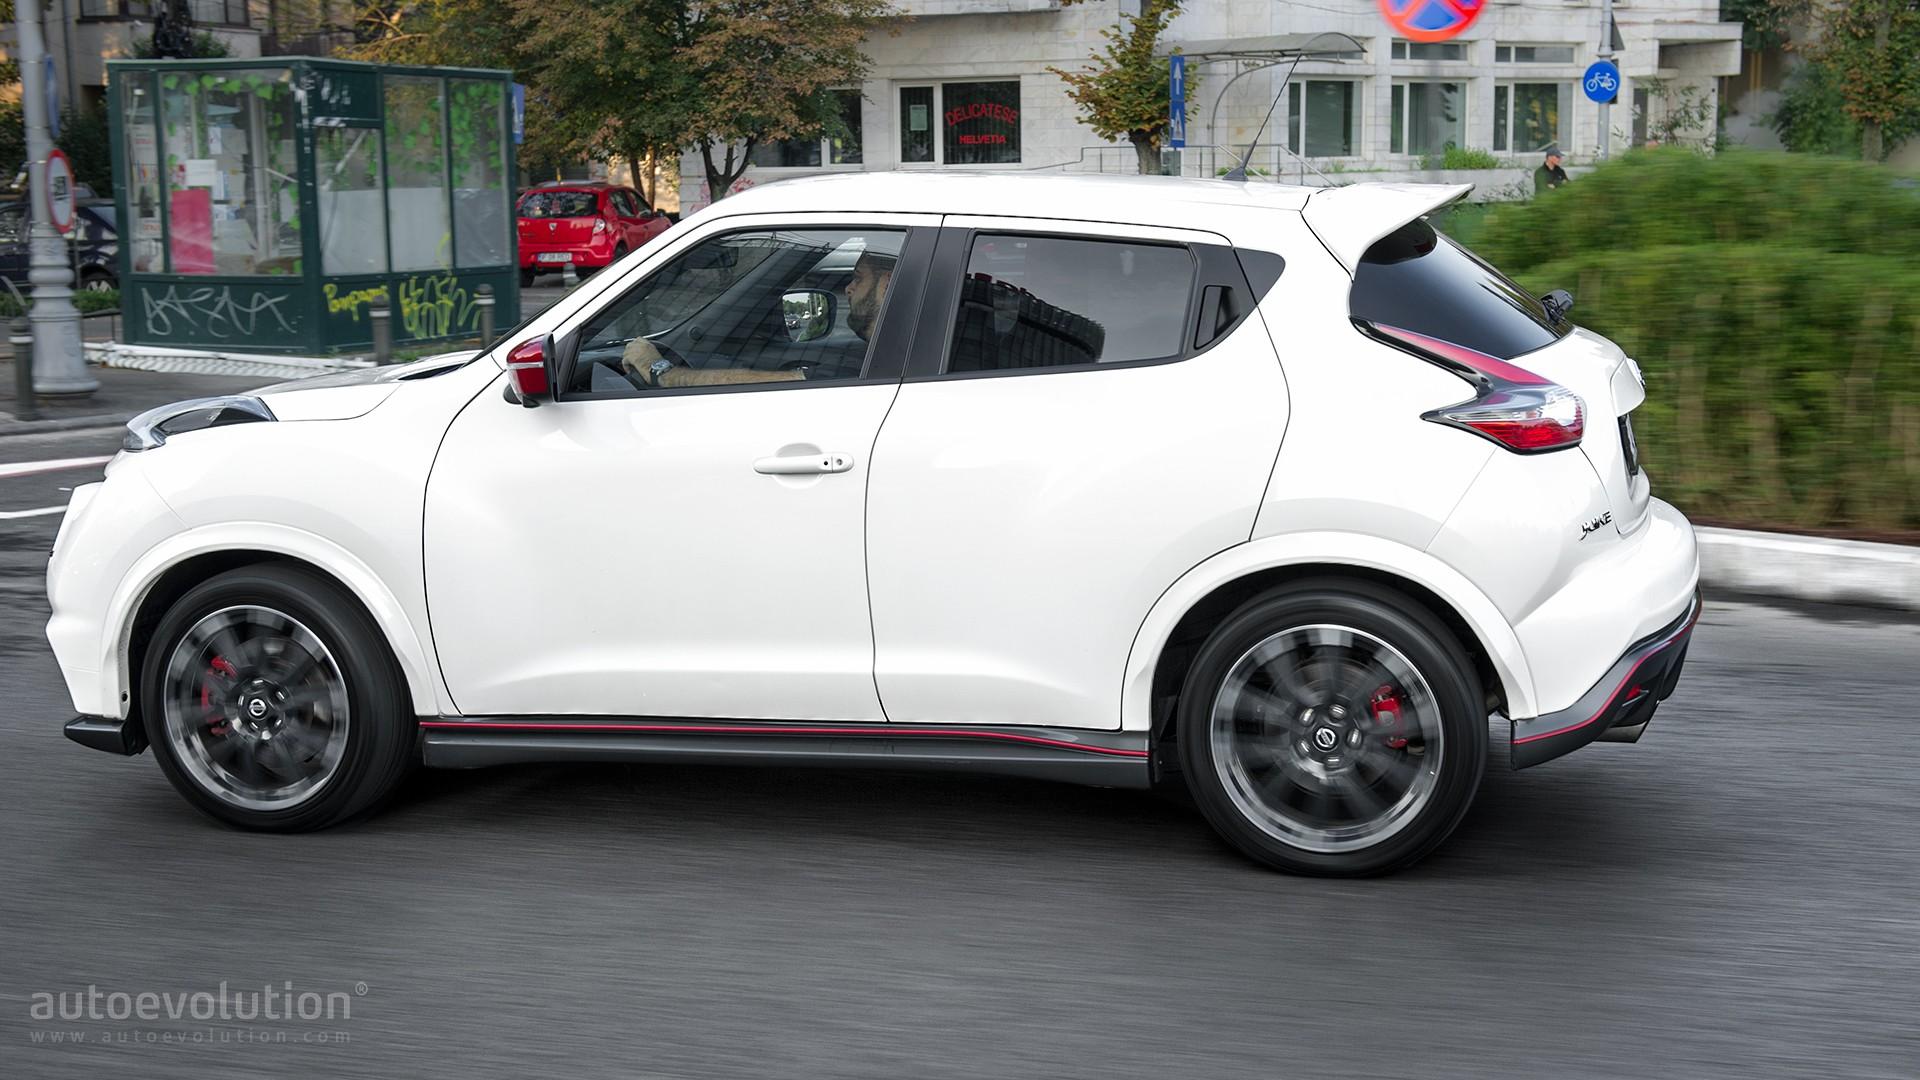 2016 Nissan Juke >> 2016 Nissan Juke Nismo RS Review - autoevolution